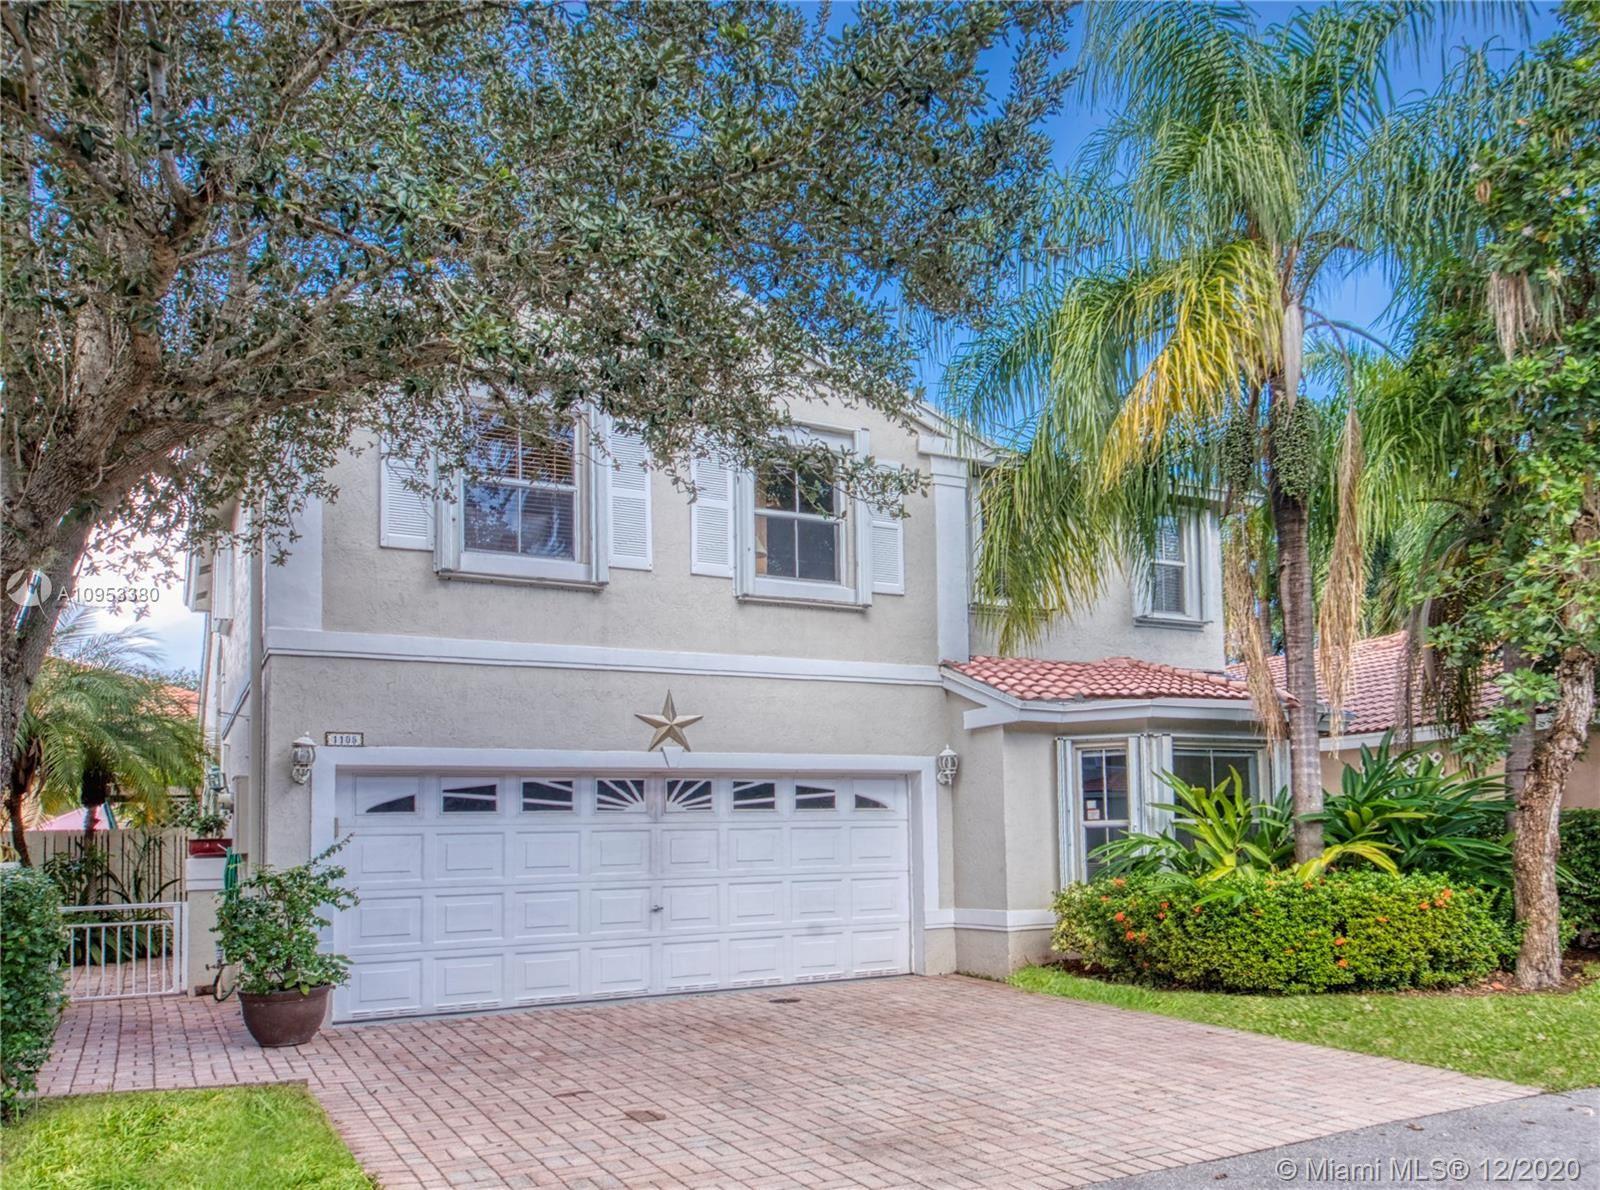 1105 Scarlet Oak St, Hollywood, FL 33019 - #: A10953380